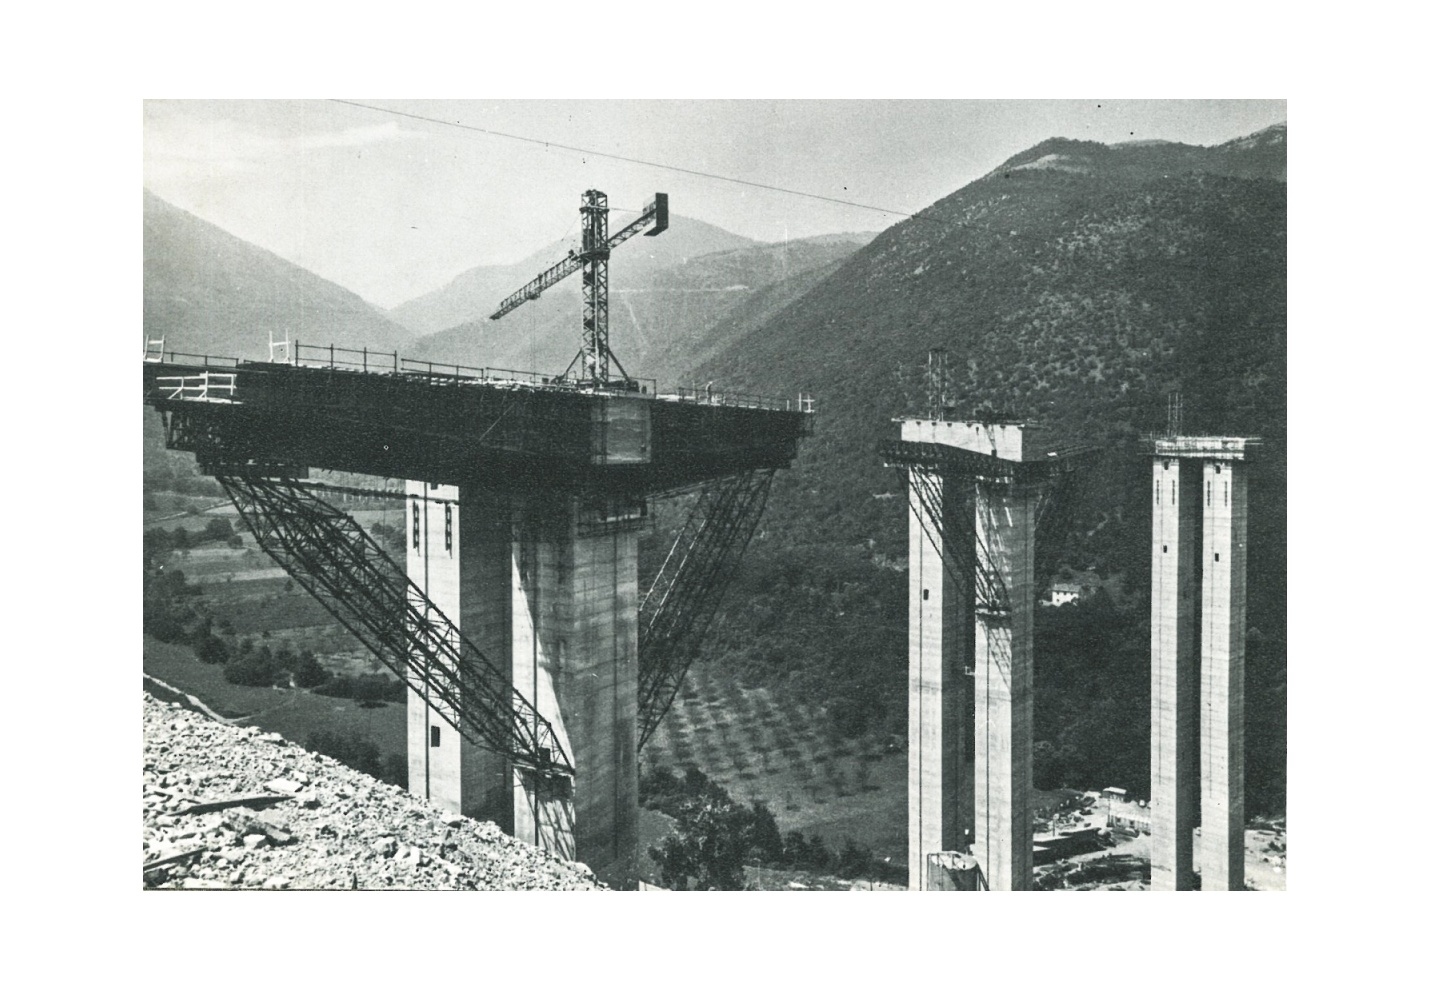 come un ponte